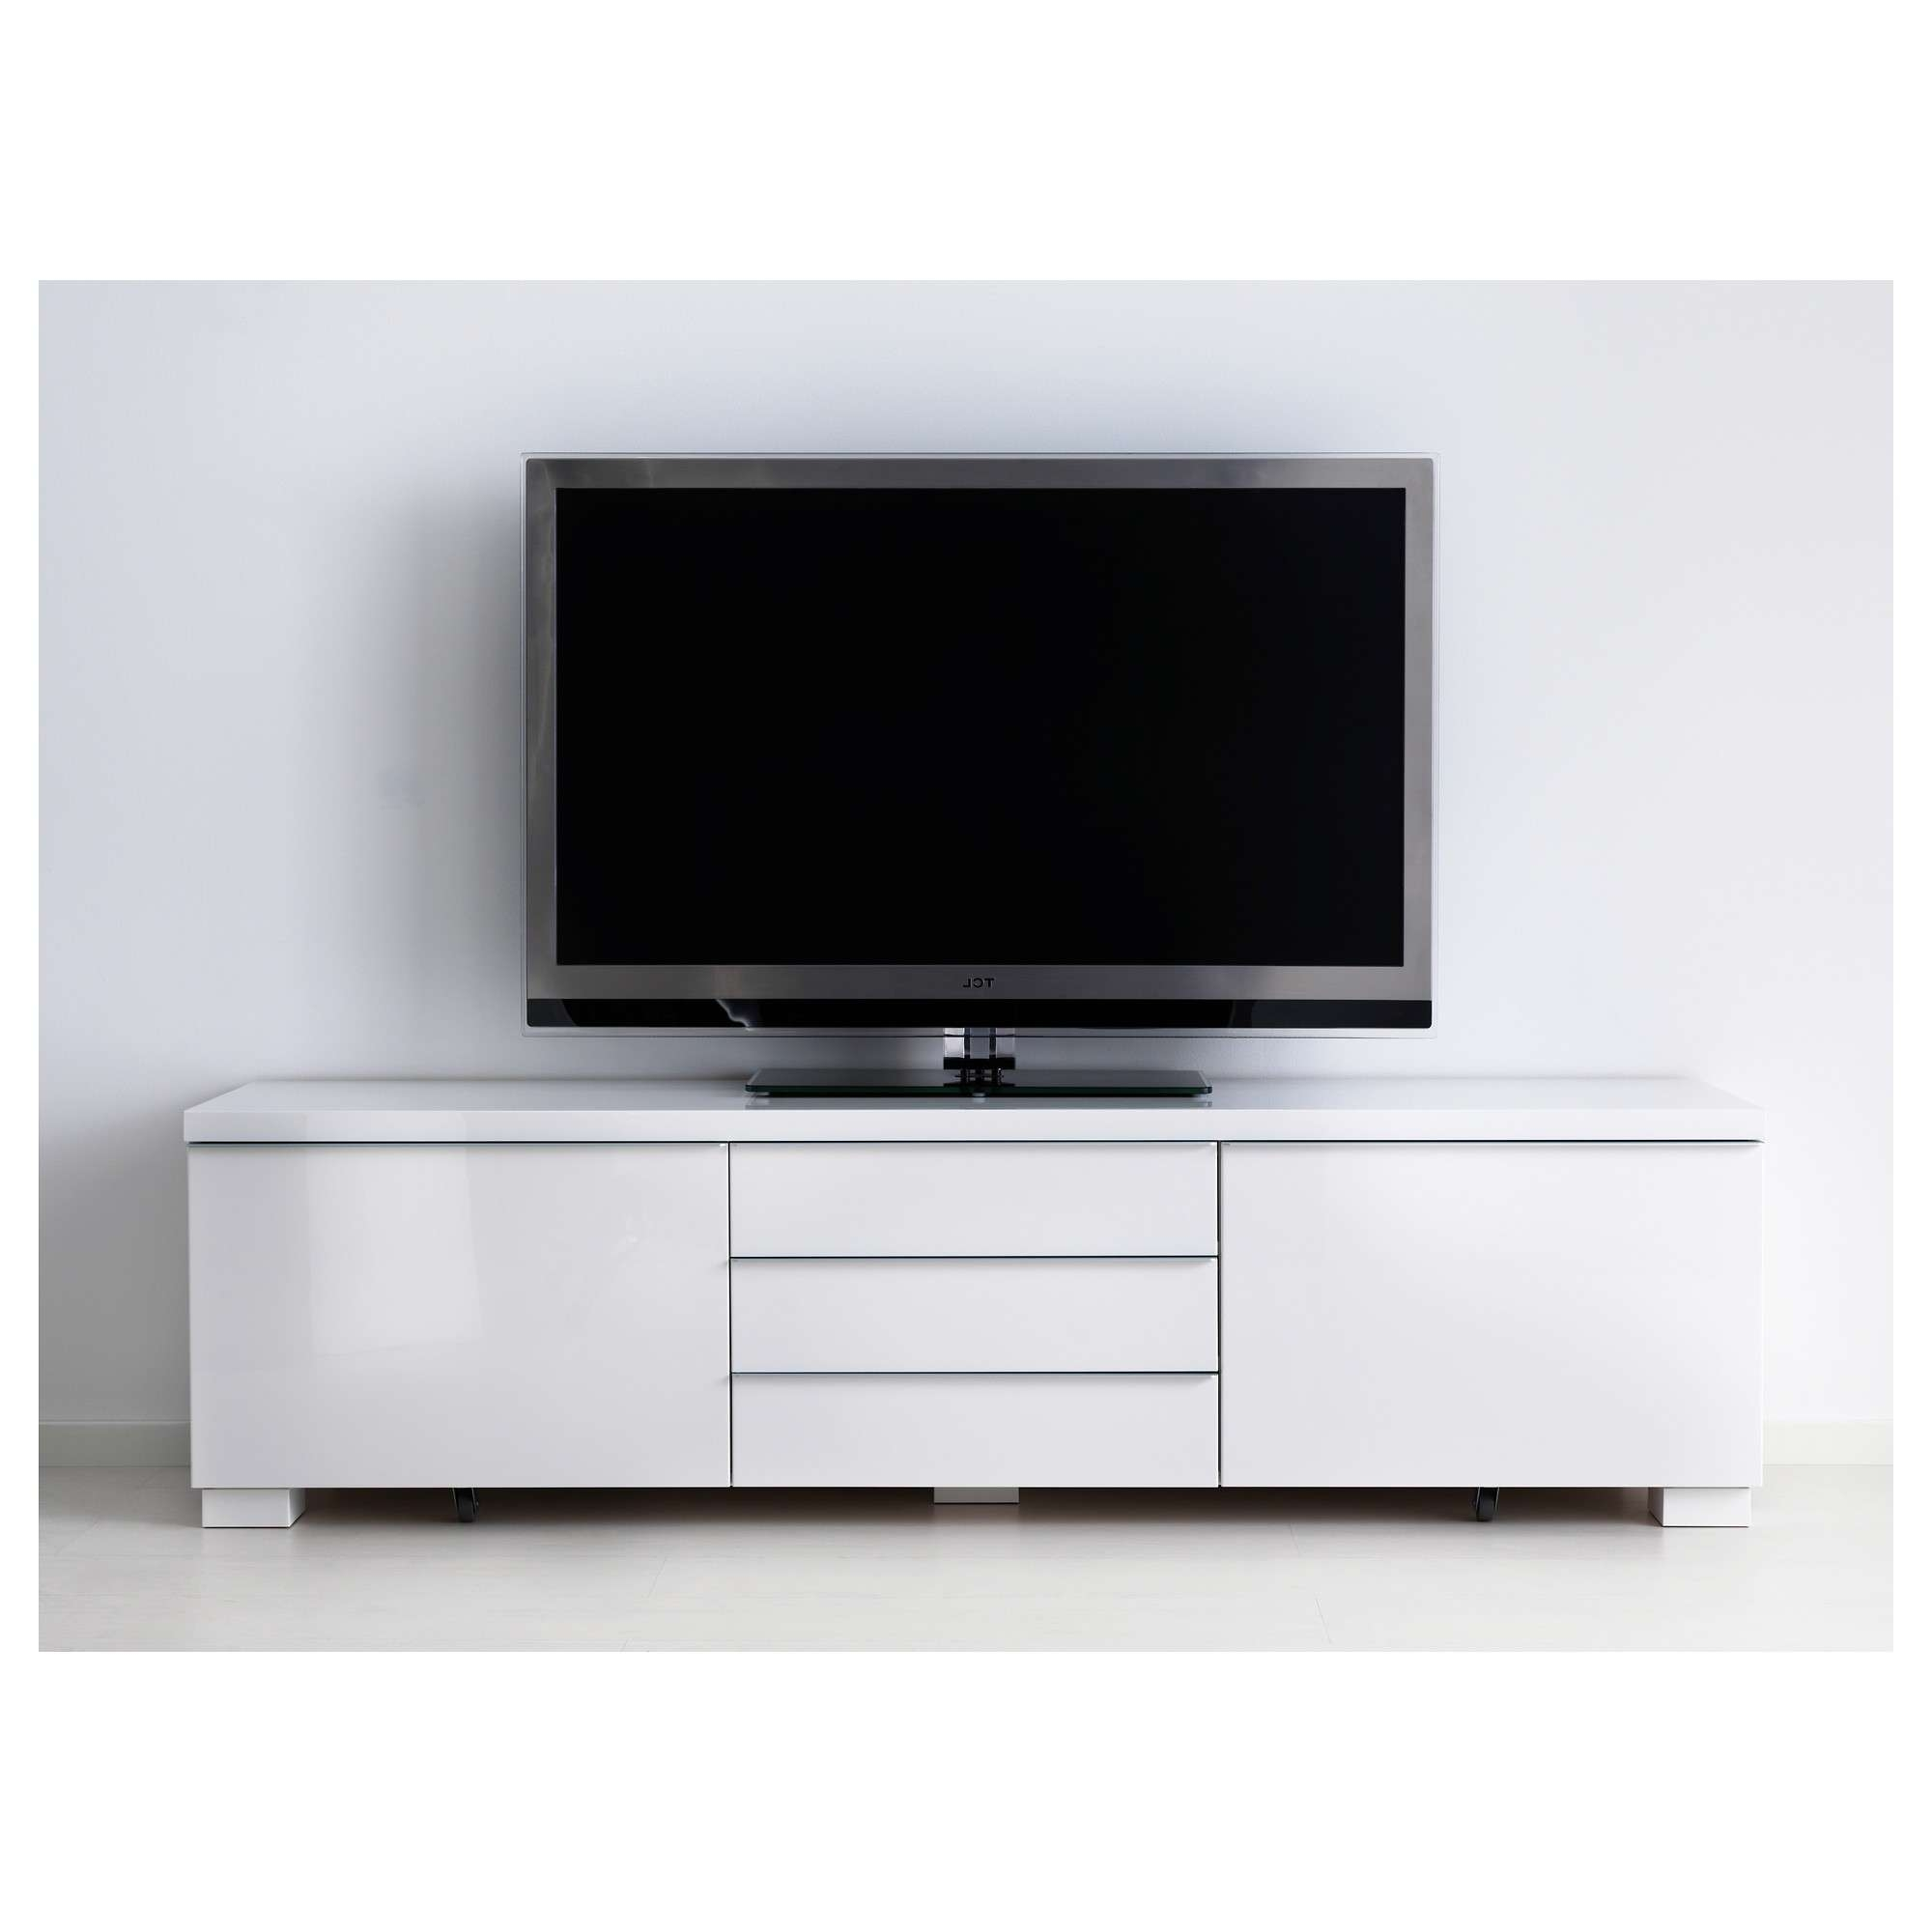 Bestå Burs Tv Bench High Gloss White 180x41 Cm – Ikea For High Gloss Tv Cabinets (View 3 of 20)